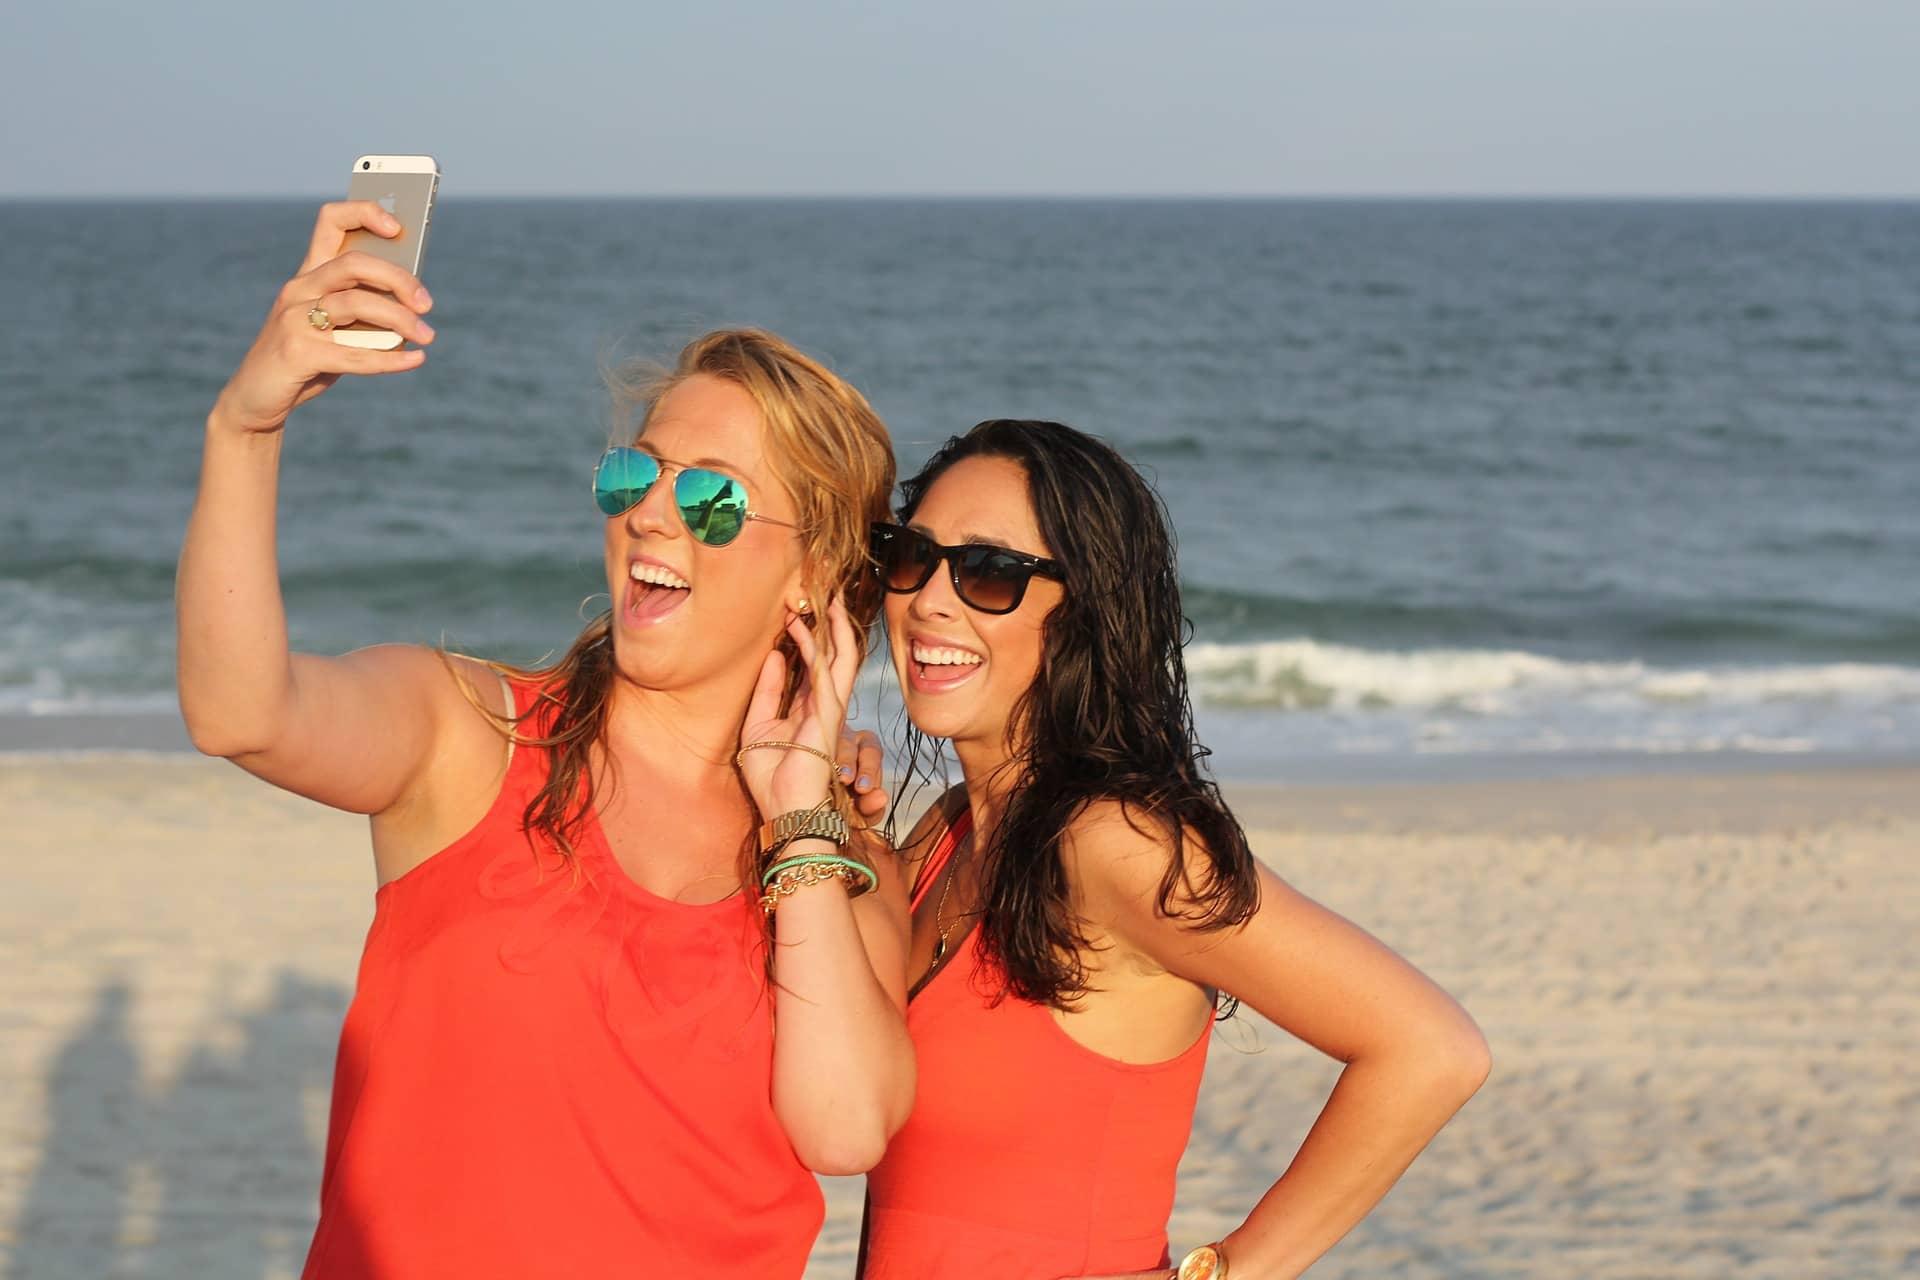 Tips for uploading photos to social media